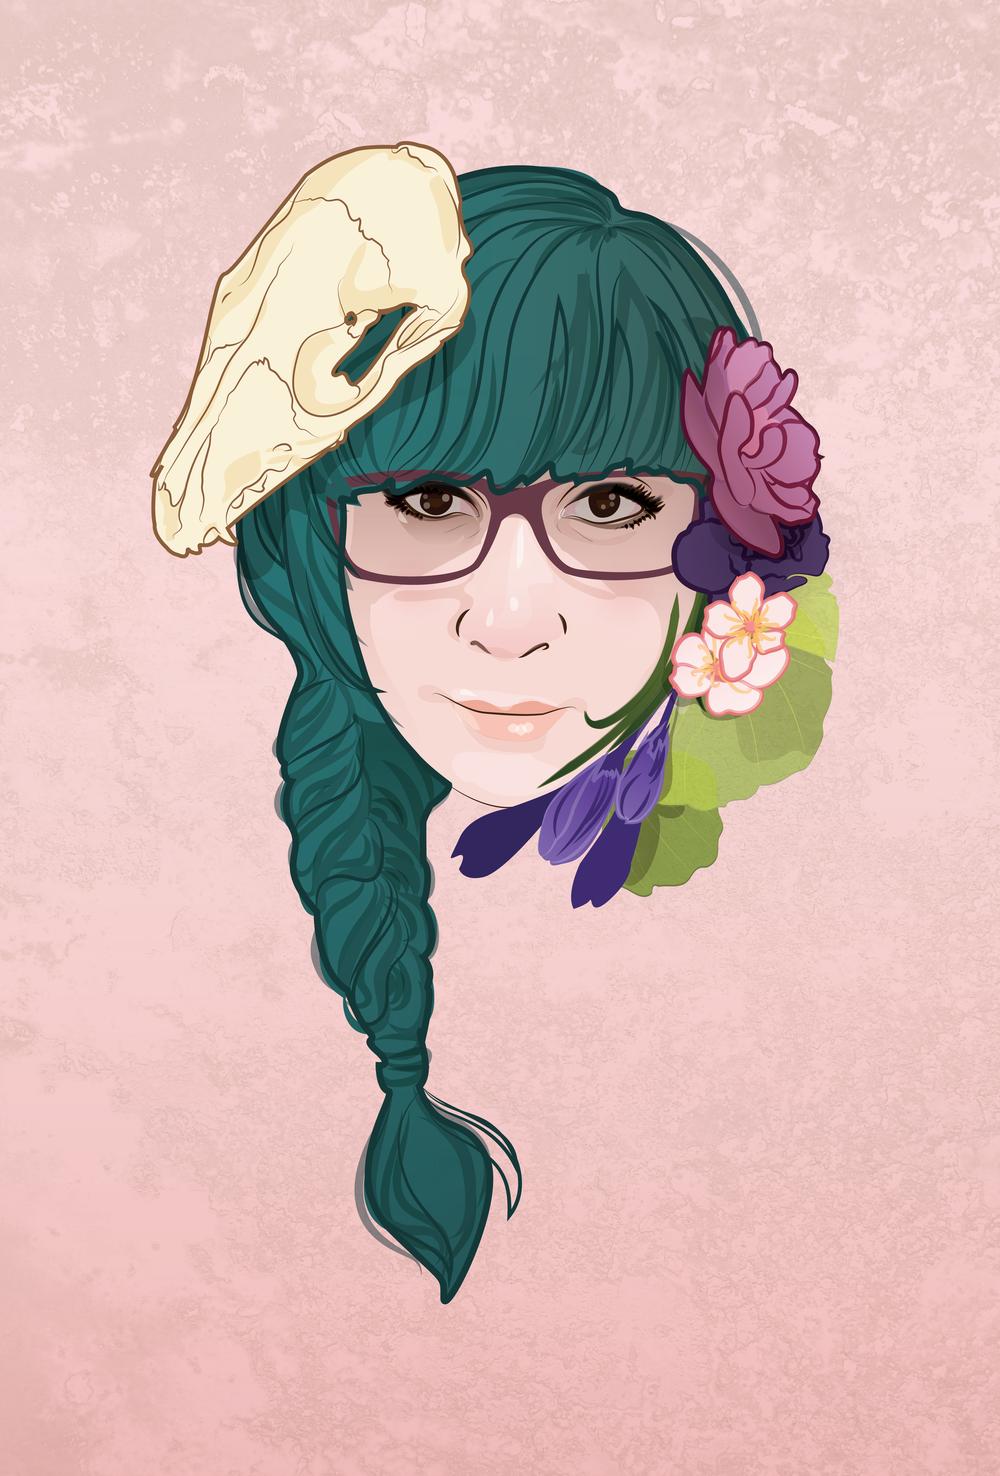 Self-Portrait '15